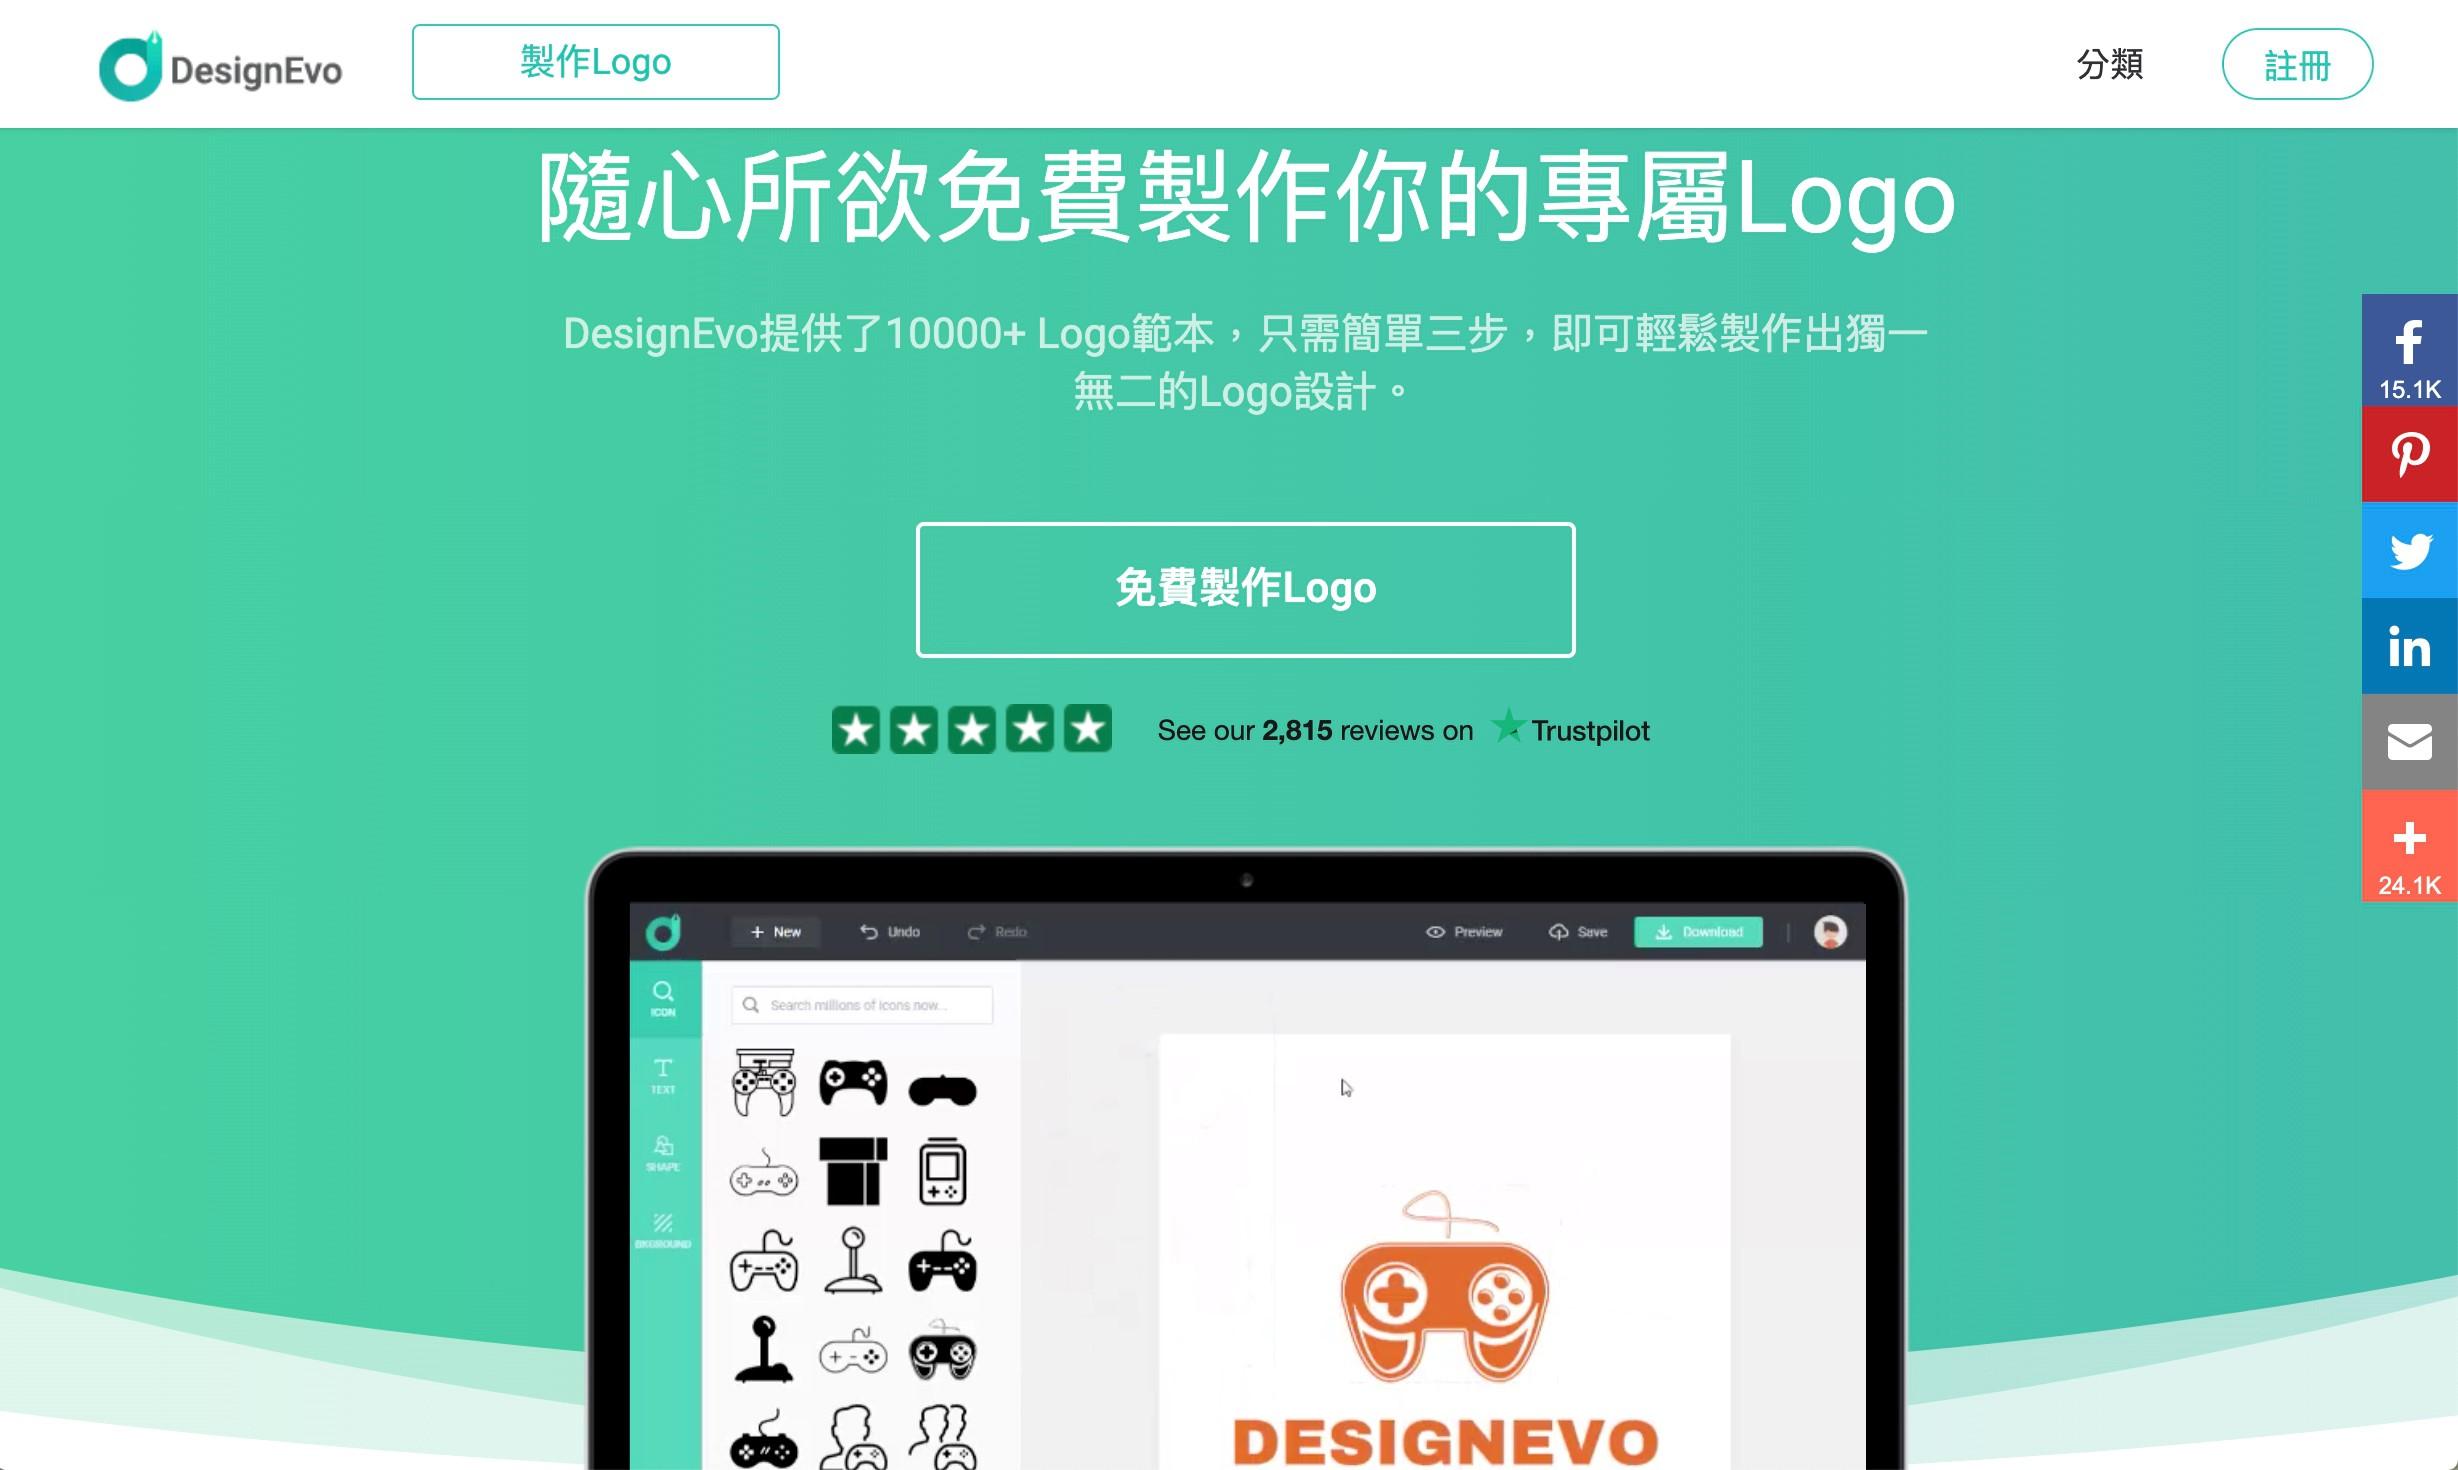 DesignEvo 免費LOGO設計軟體